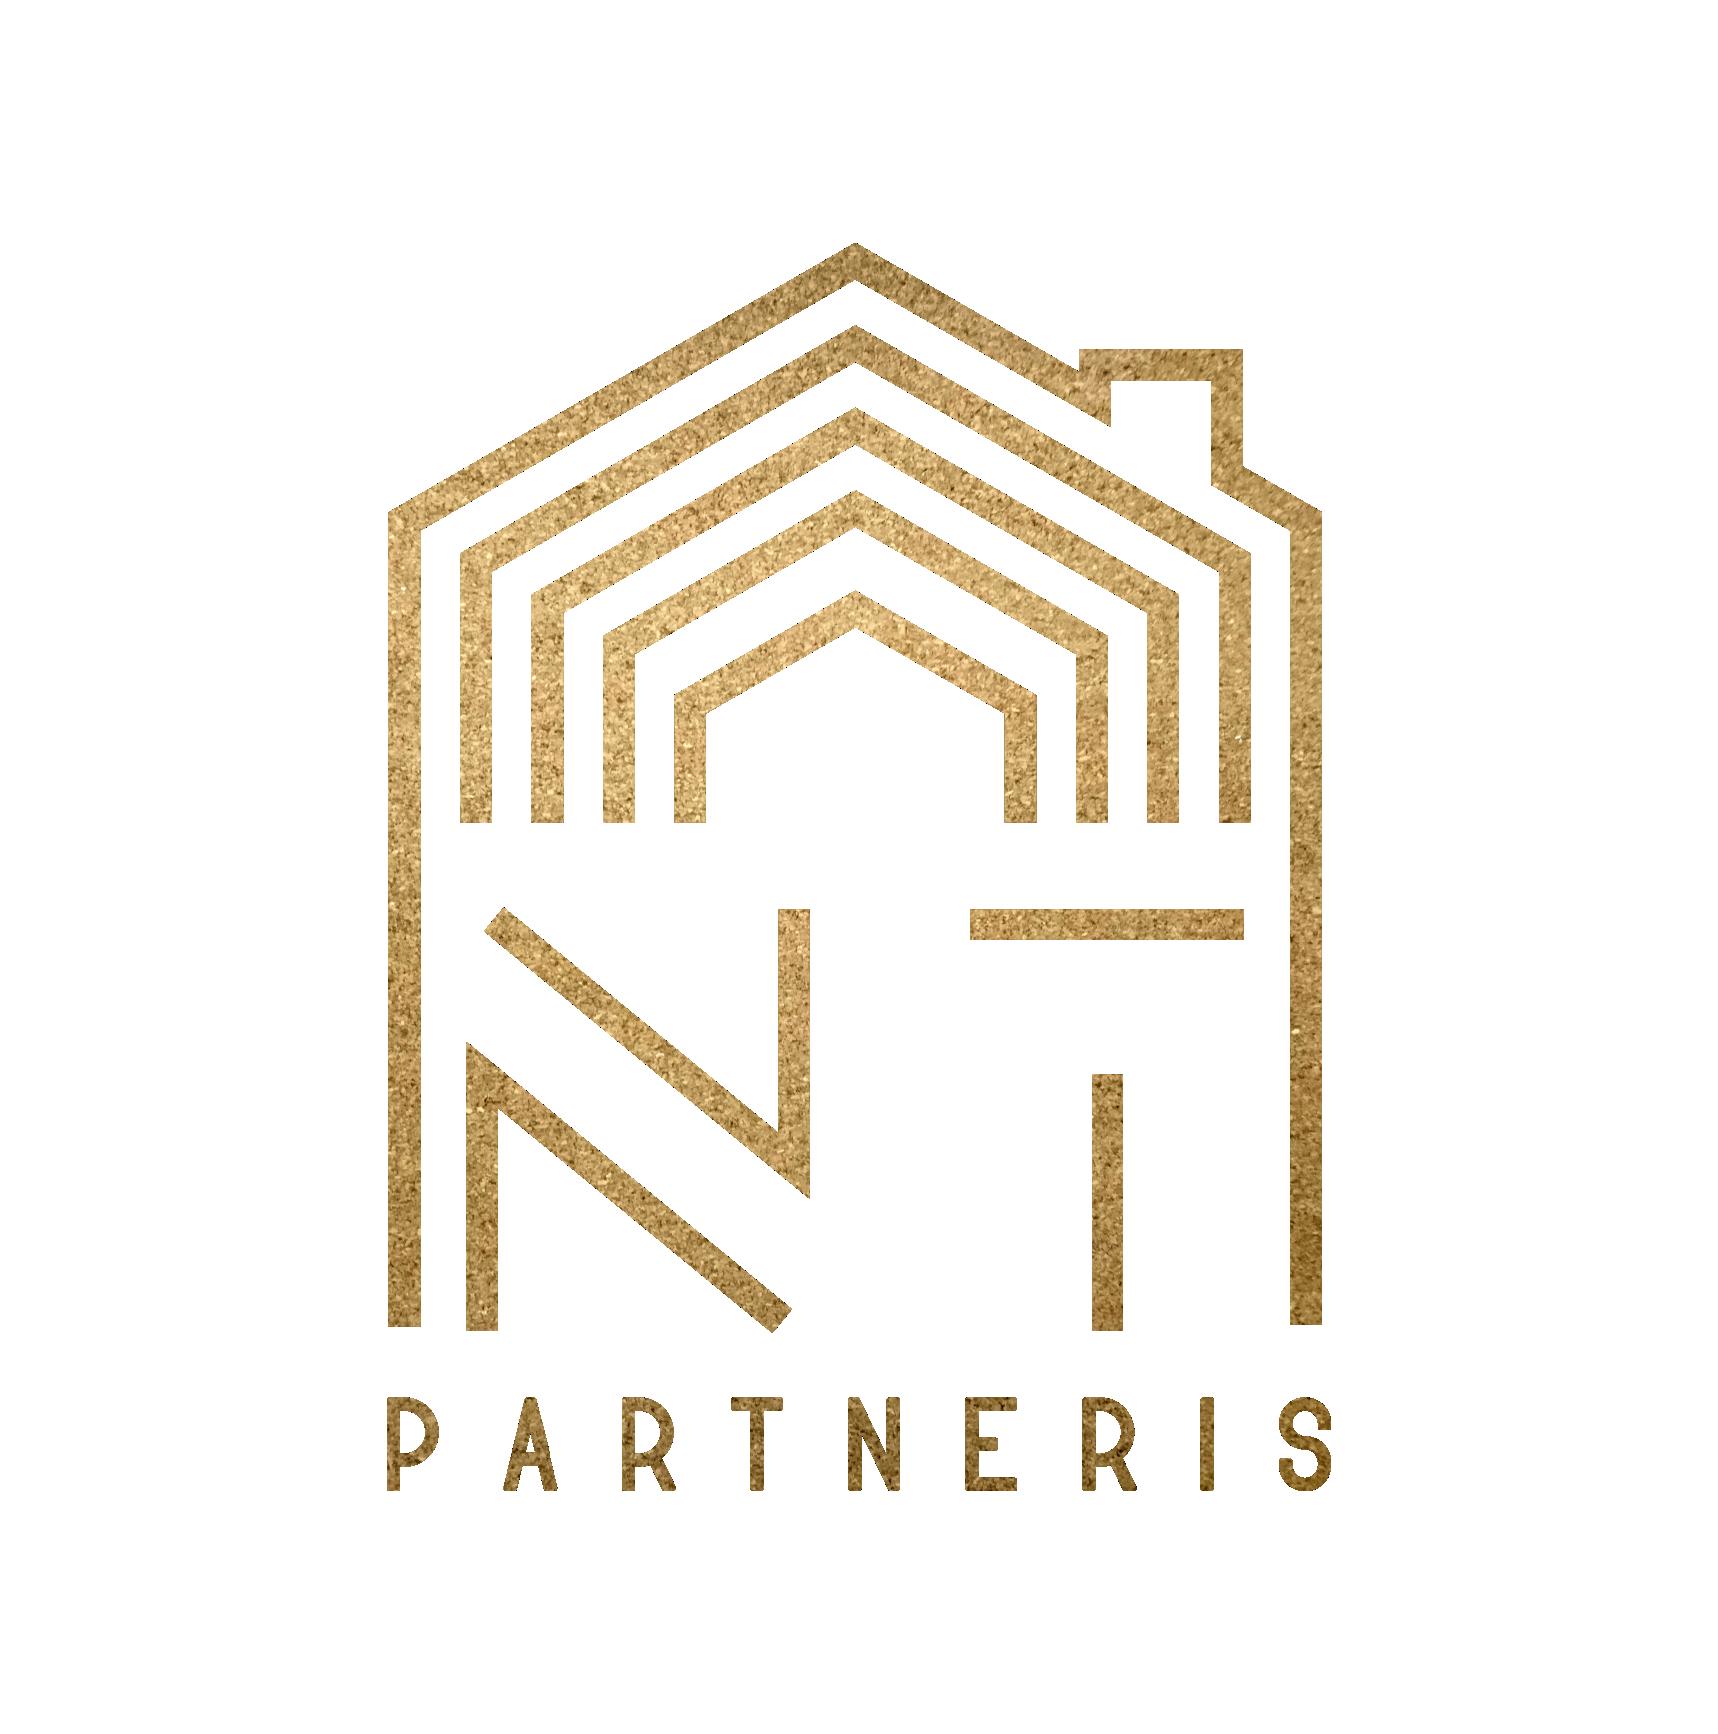 NT Partneris